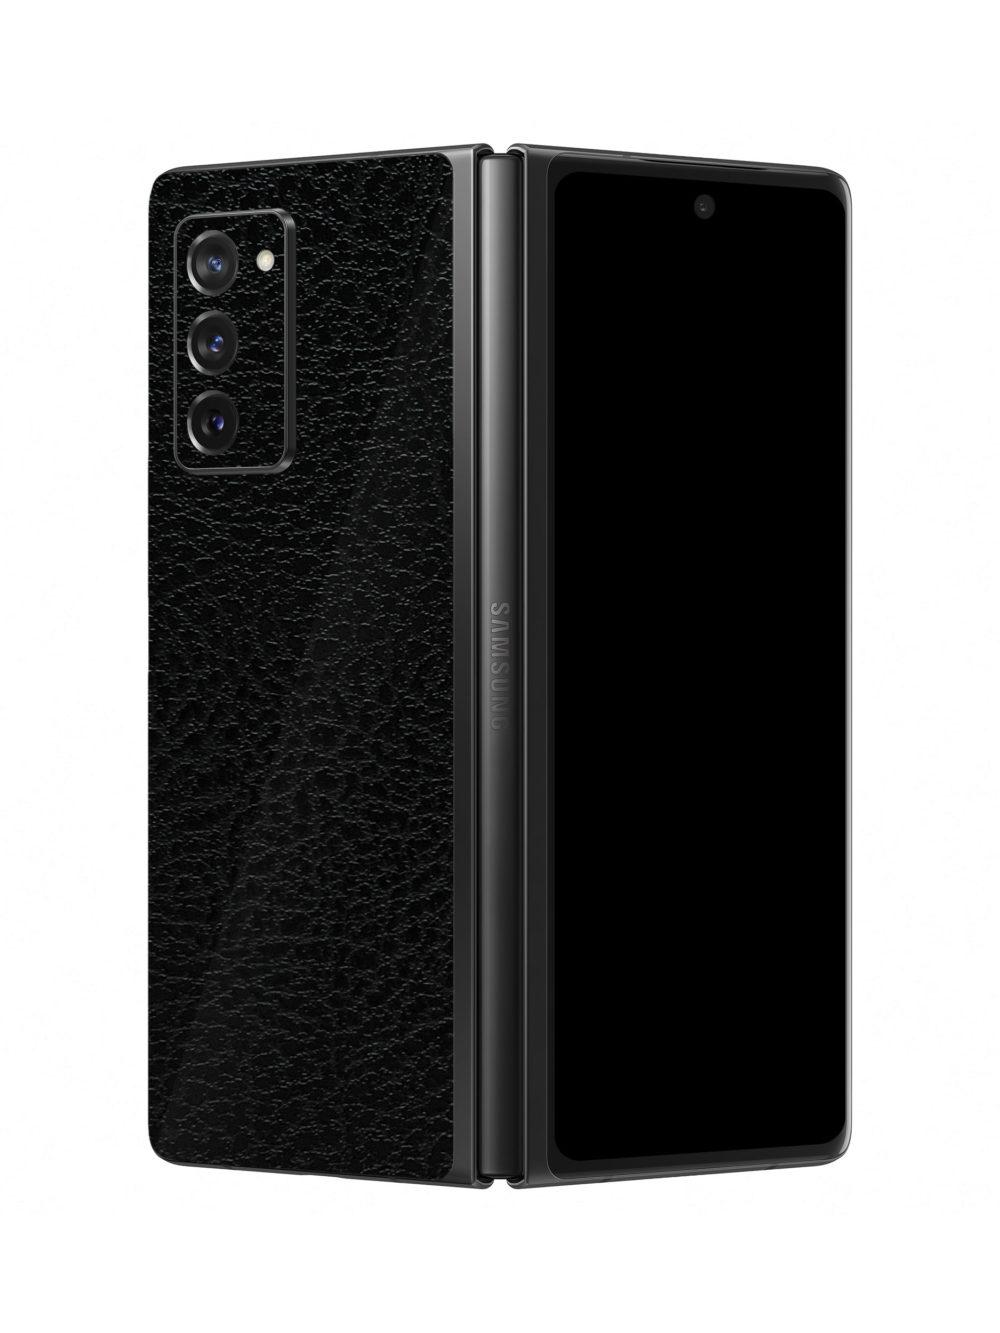 3M Textured Black Leather Skin For Samsung Galaxy Z Fold2 5G